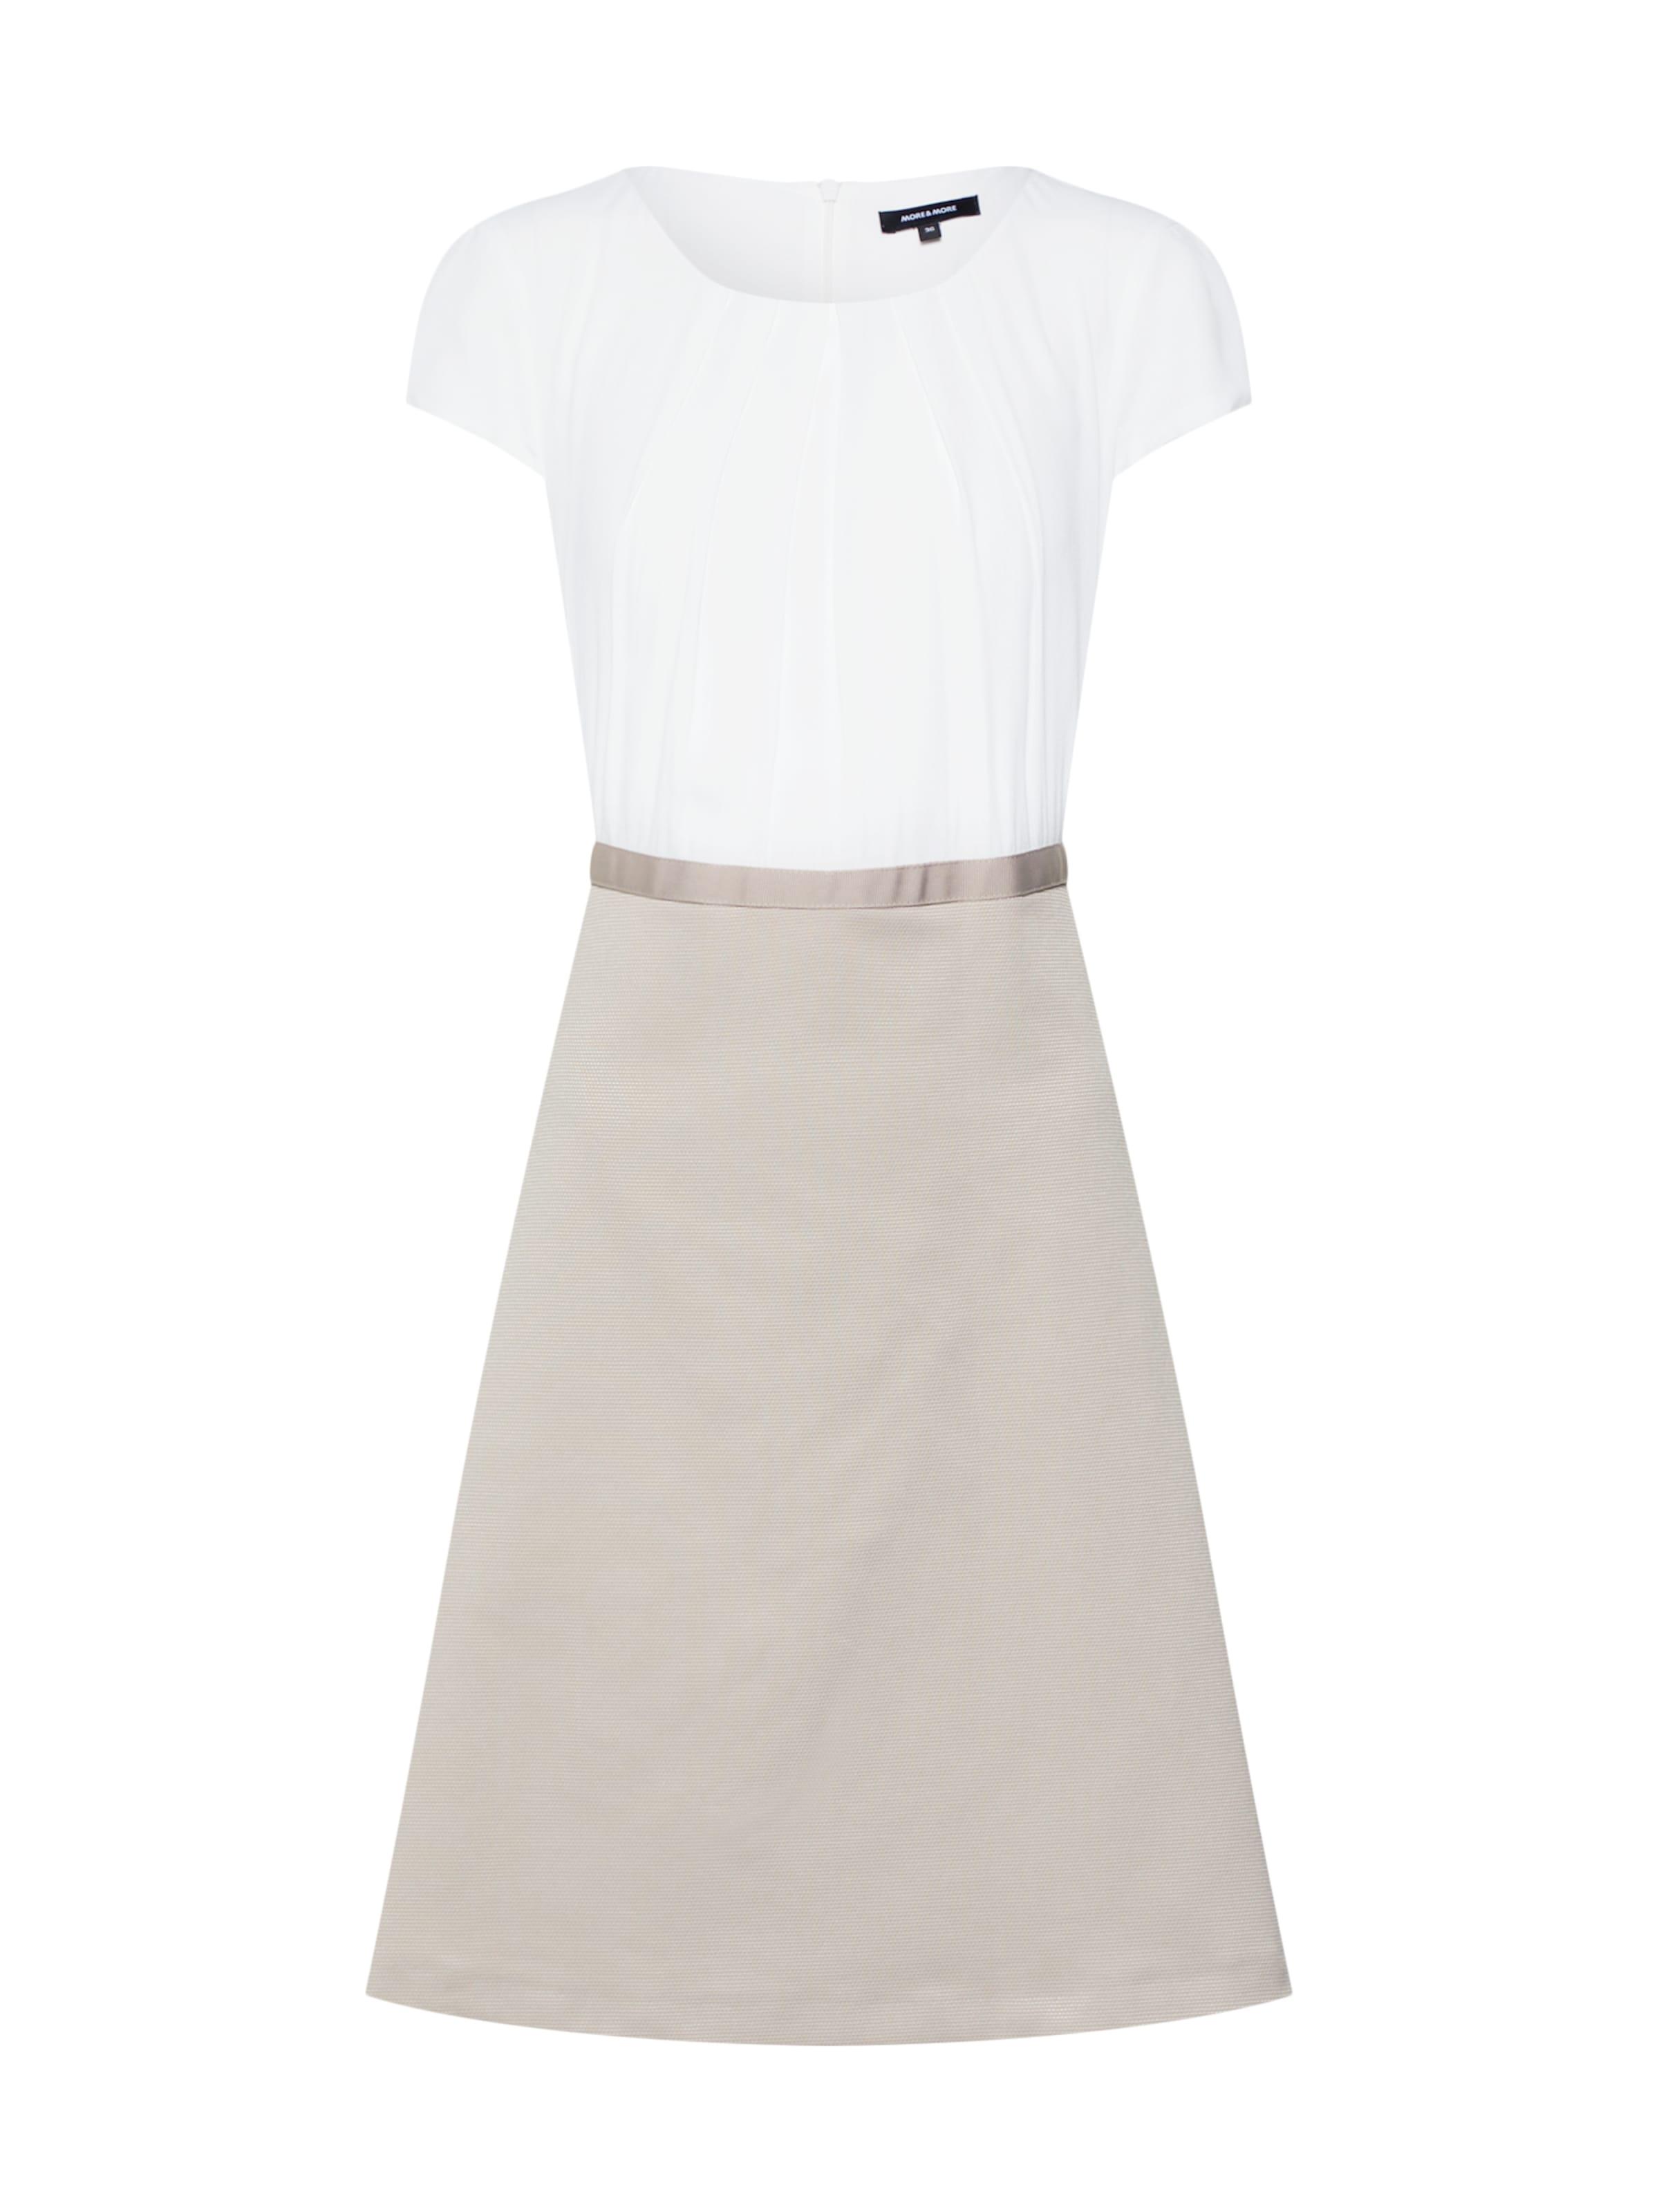 Moreamp; In DamenKleider Dress Active' 'patched CremeSand 4jR5LA